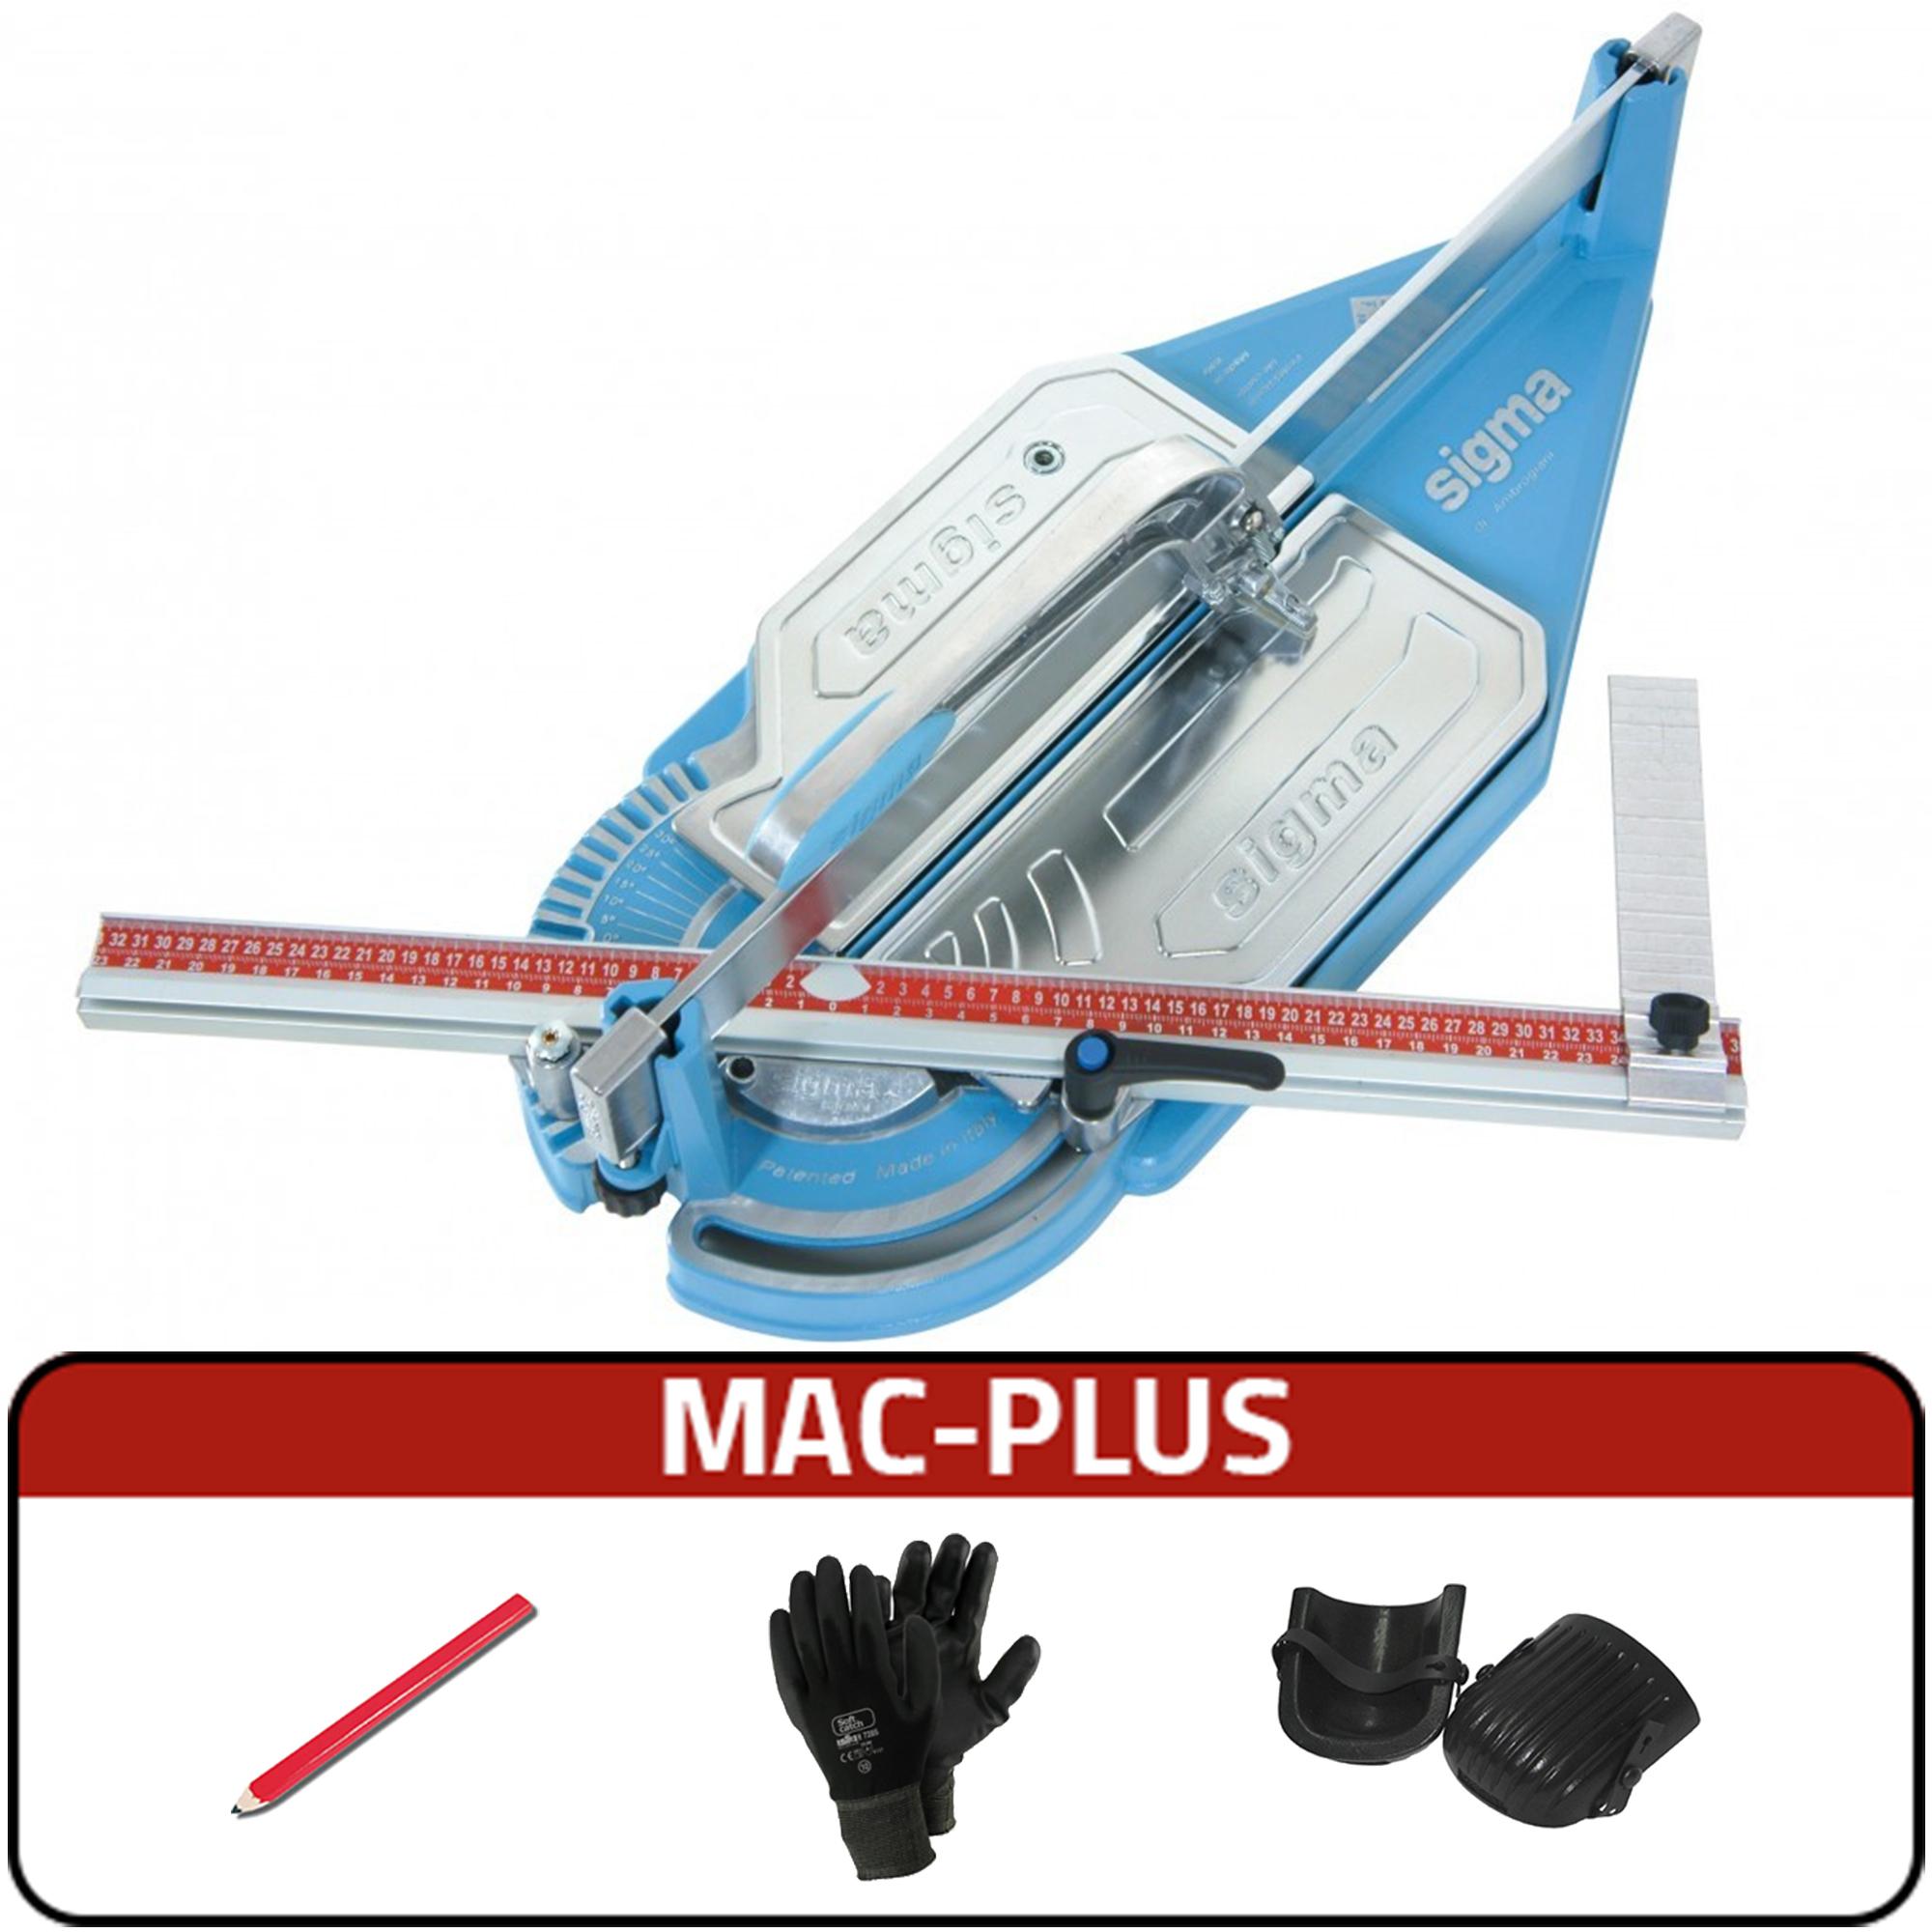 Image of Tagliapiastrelle Sigma 3L3M - Serie 3 MAX + MAC - PLUS